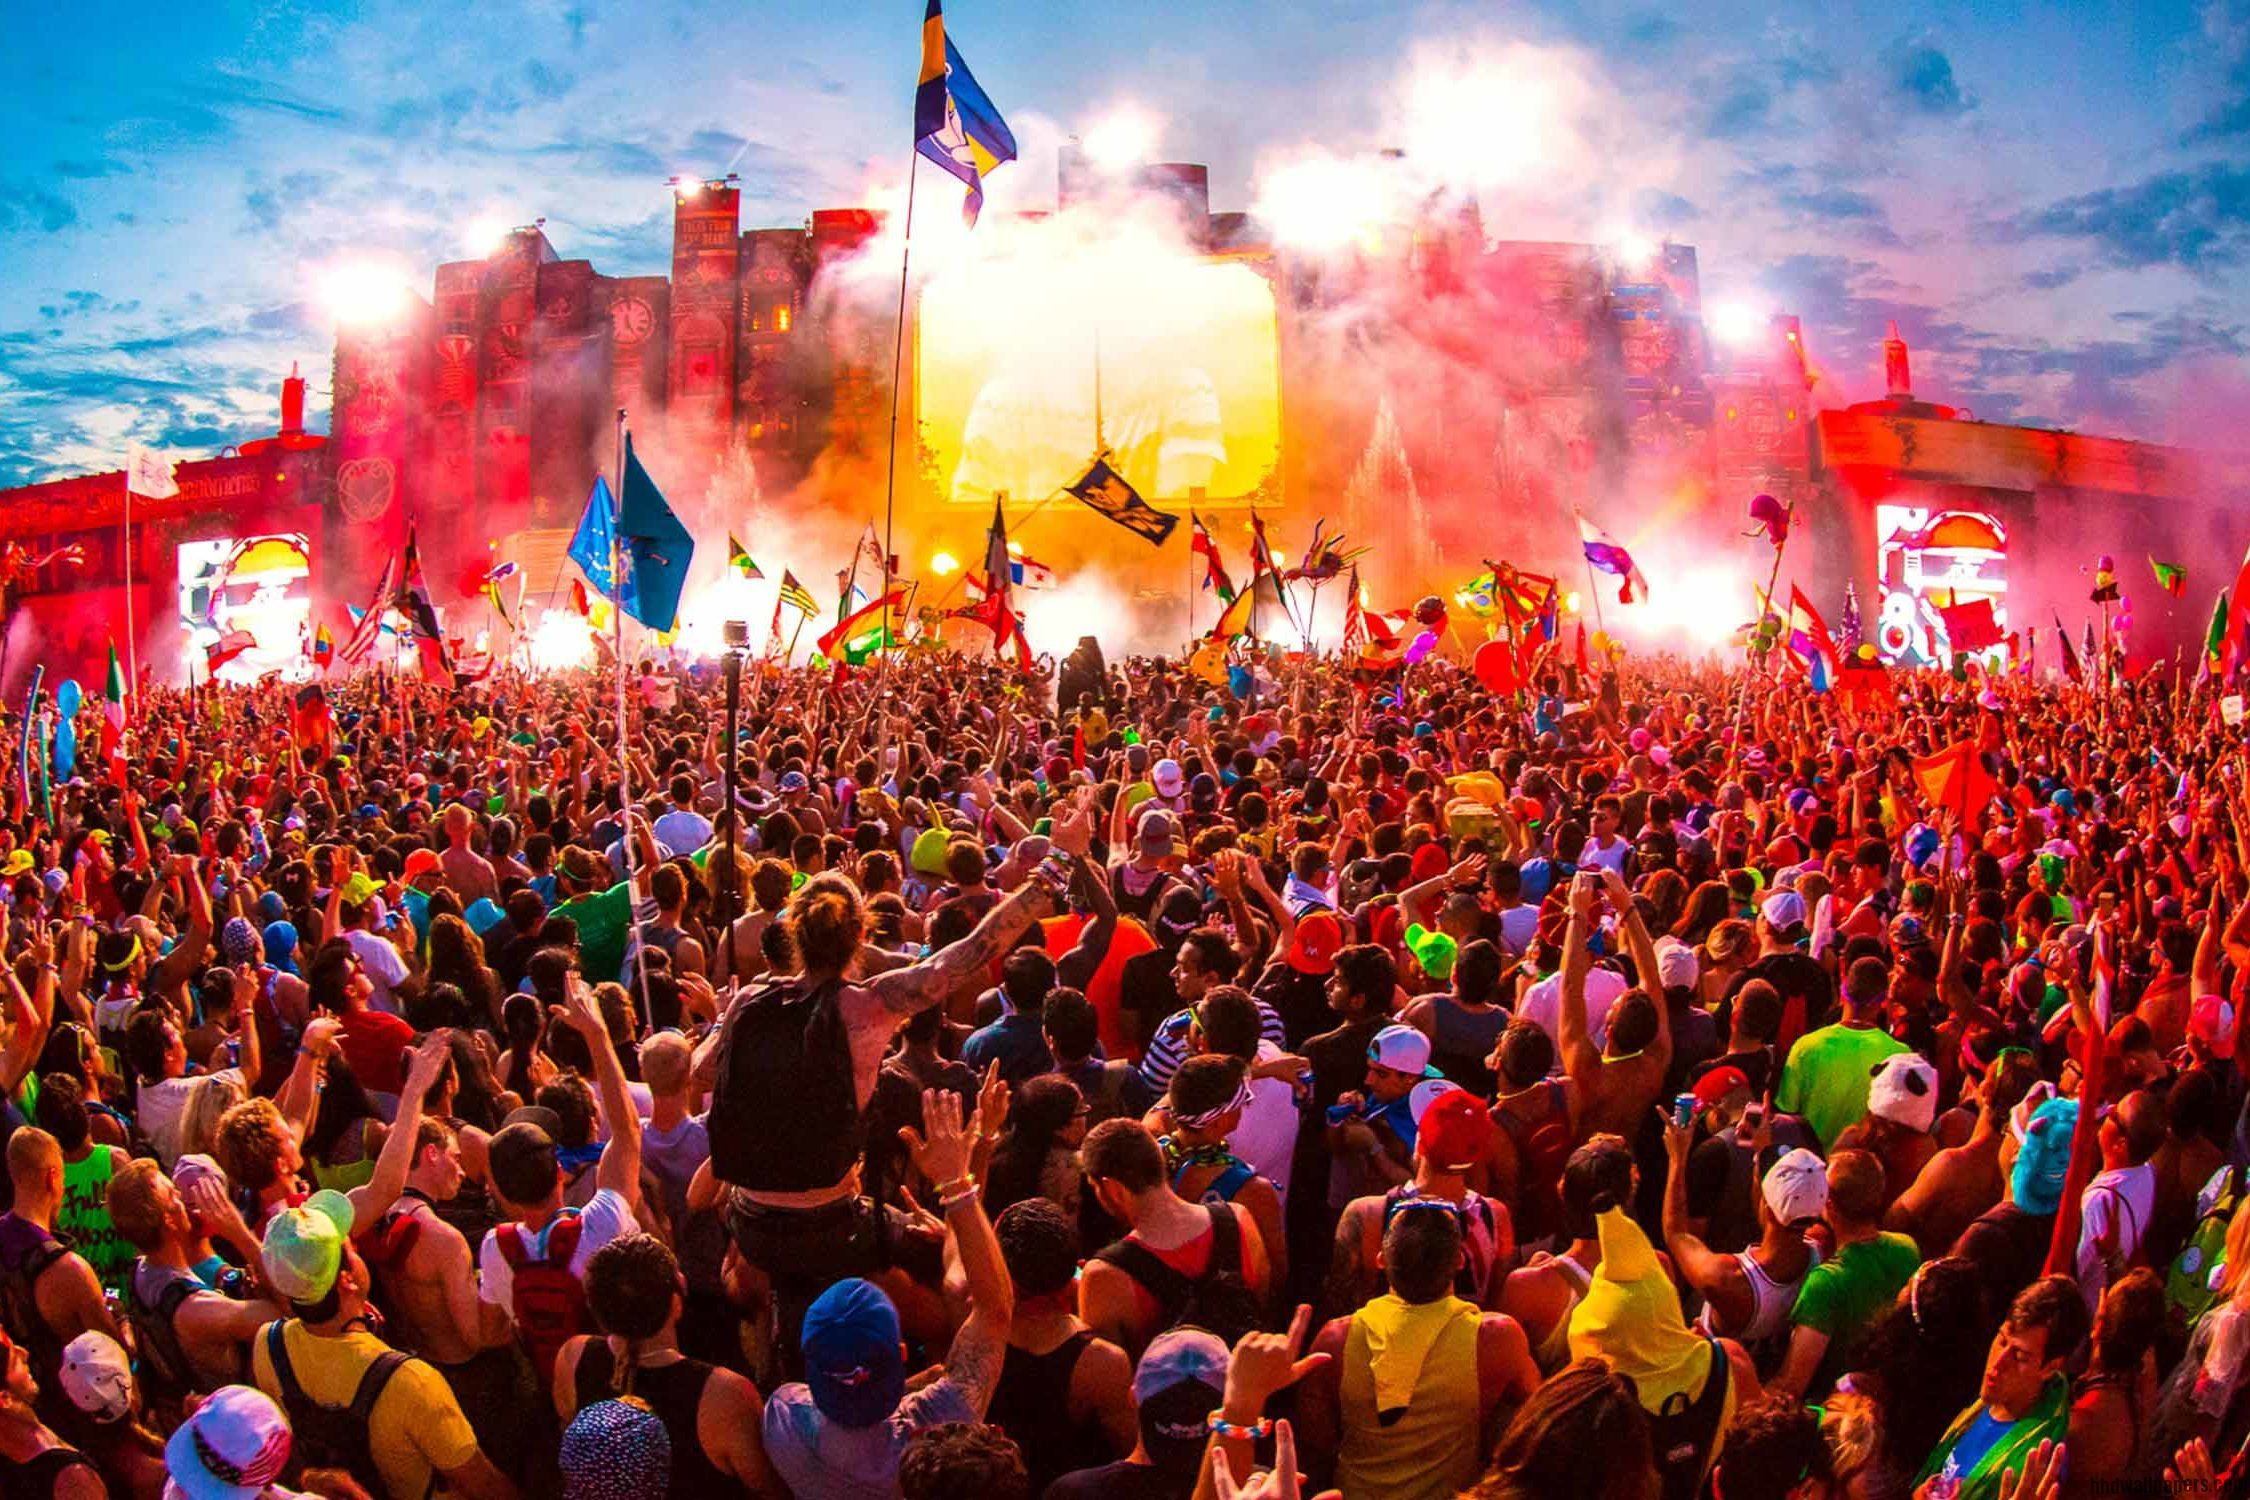 2019 Tomorrowland Event